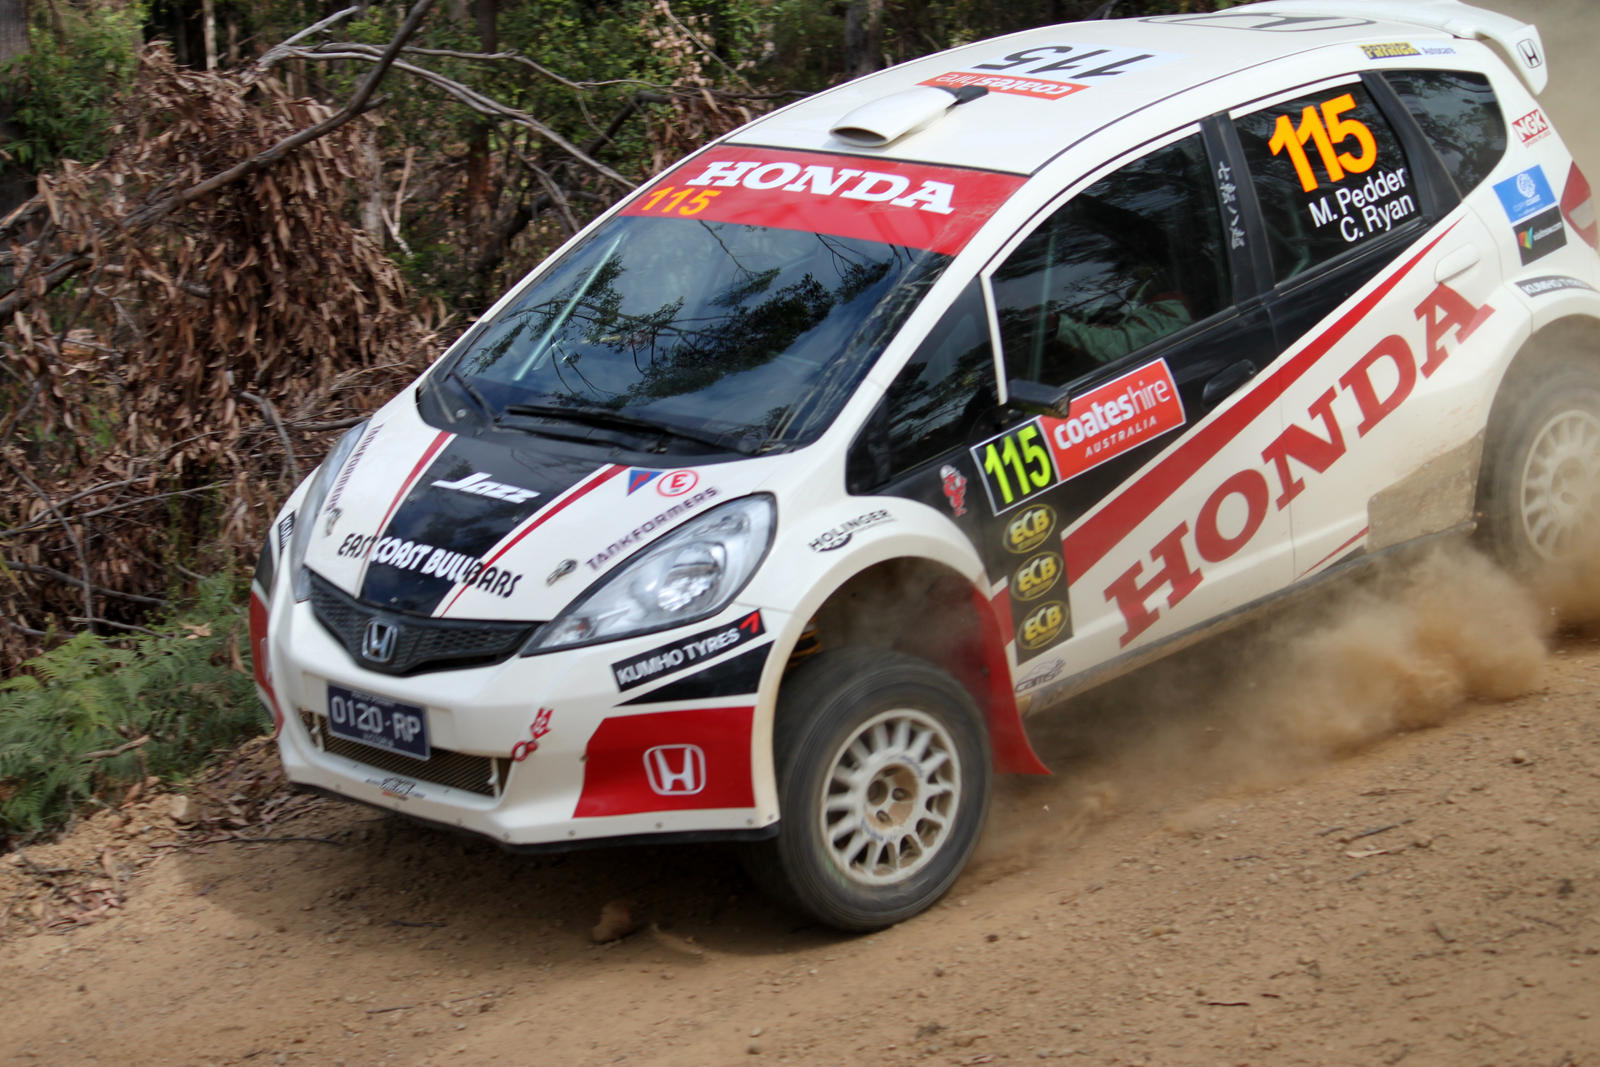 Honda Jazz Rally Australia 2013 by TarJakArt